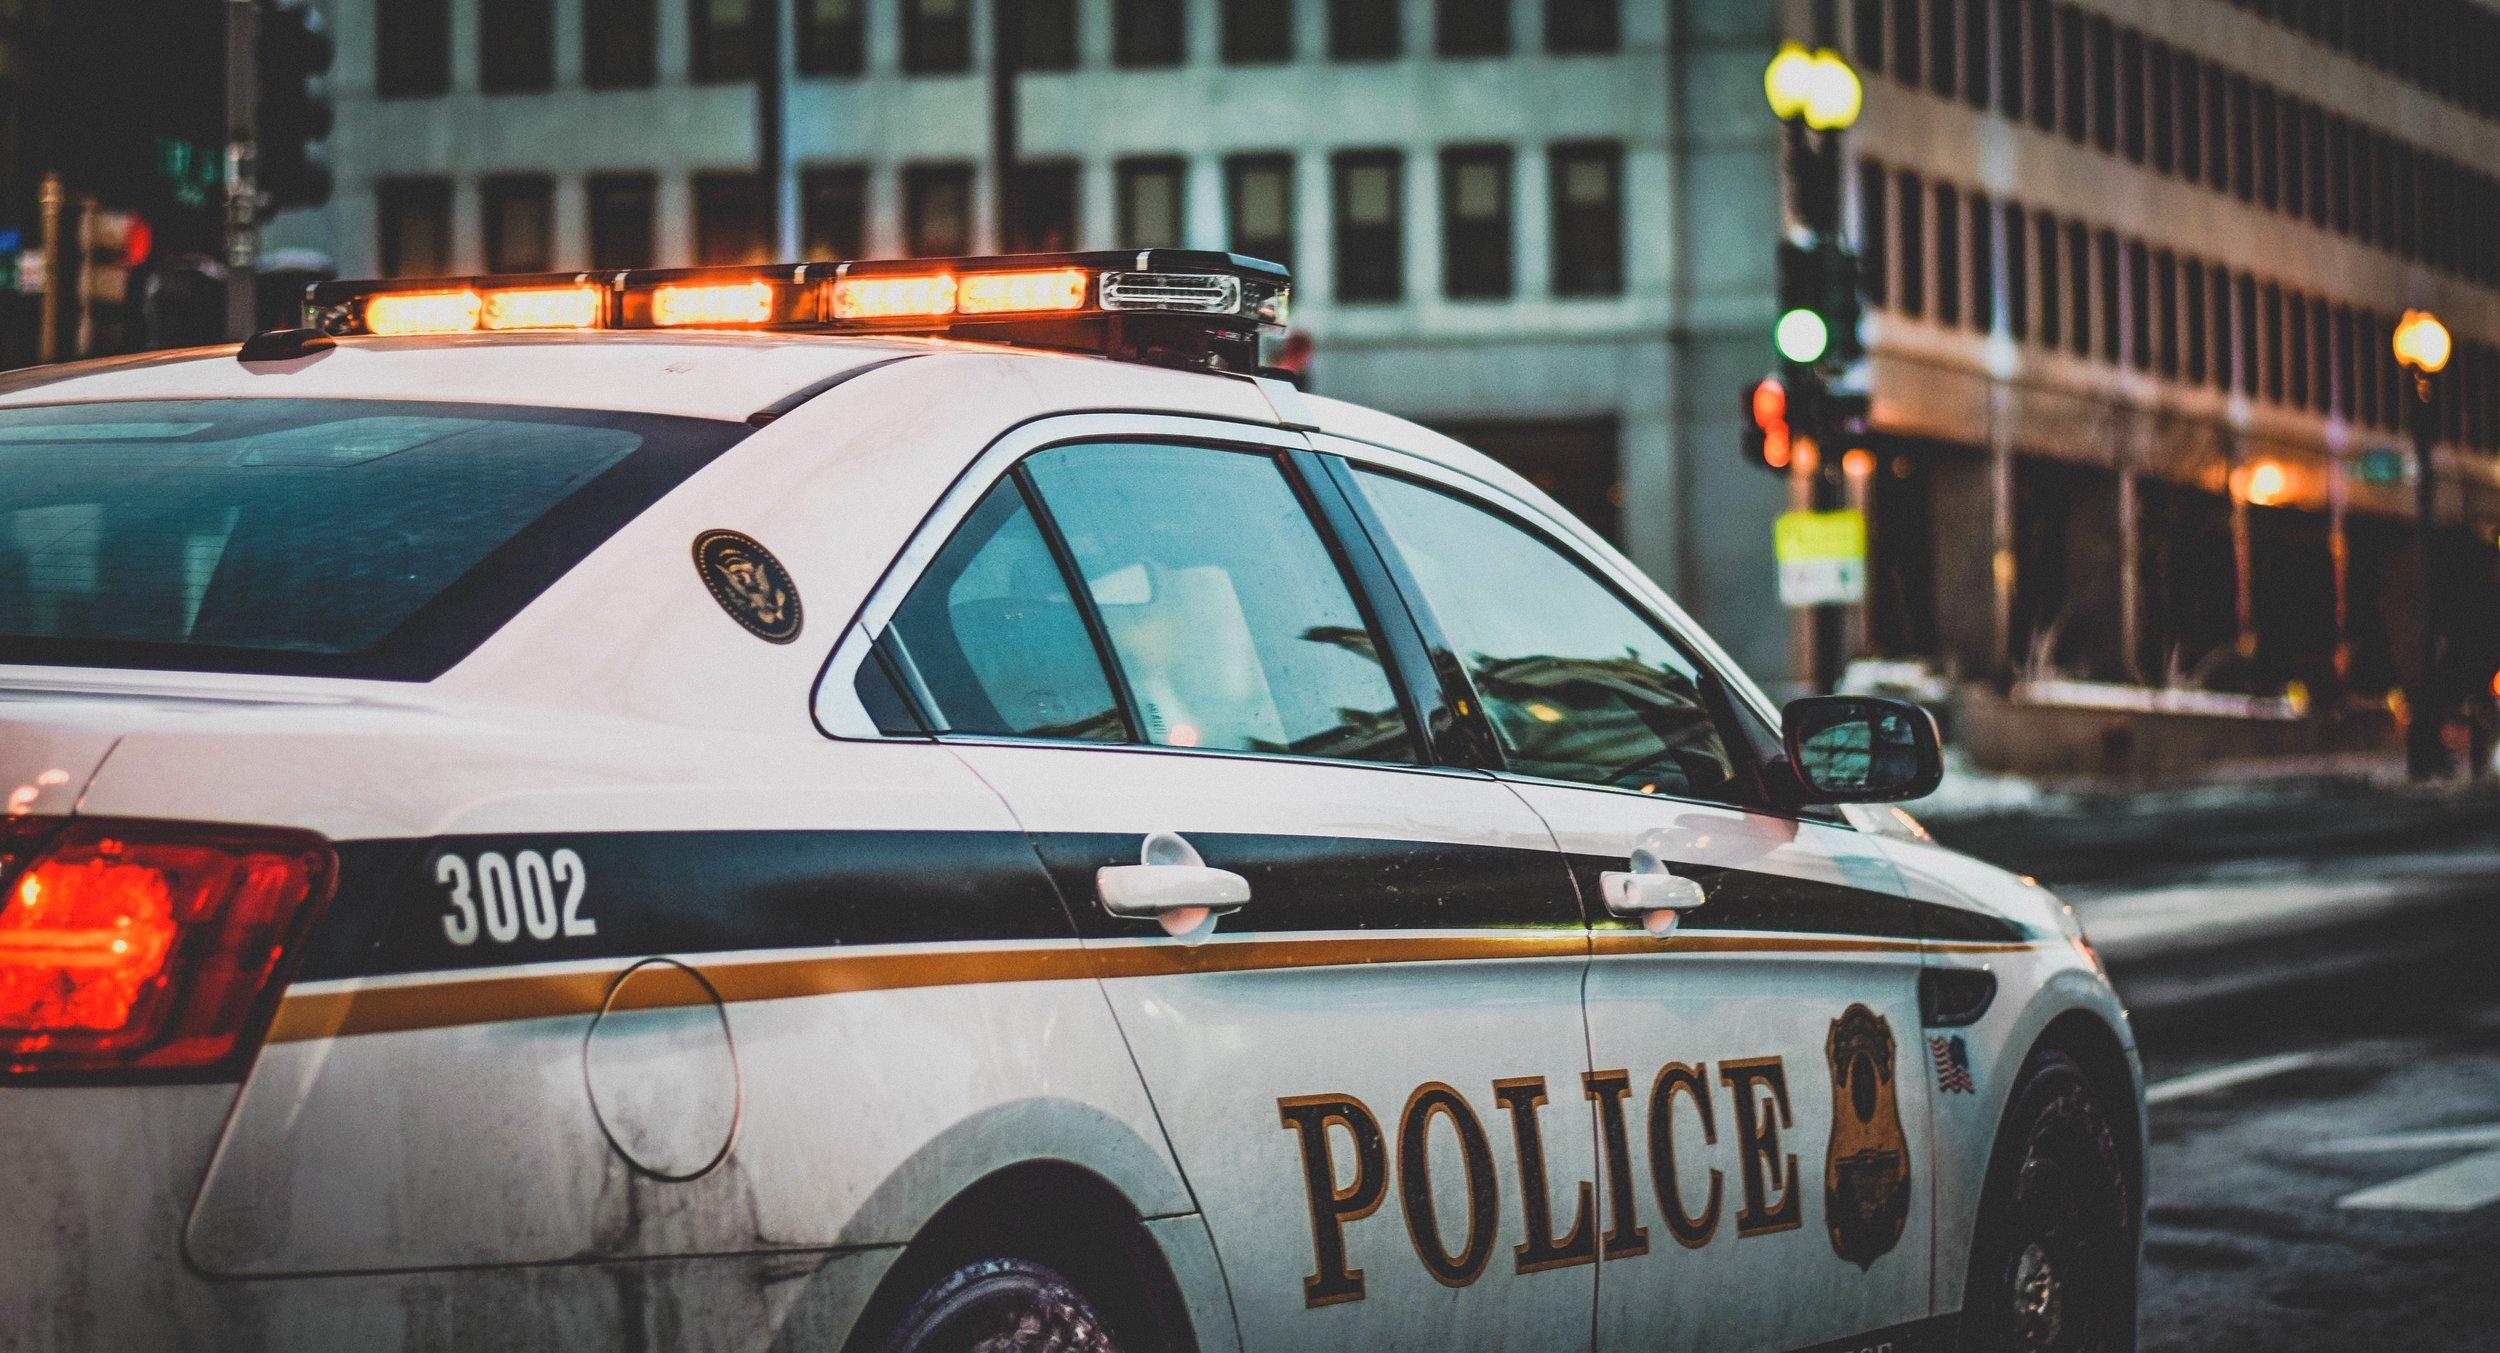 police photo.jpeg